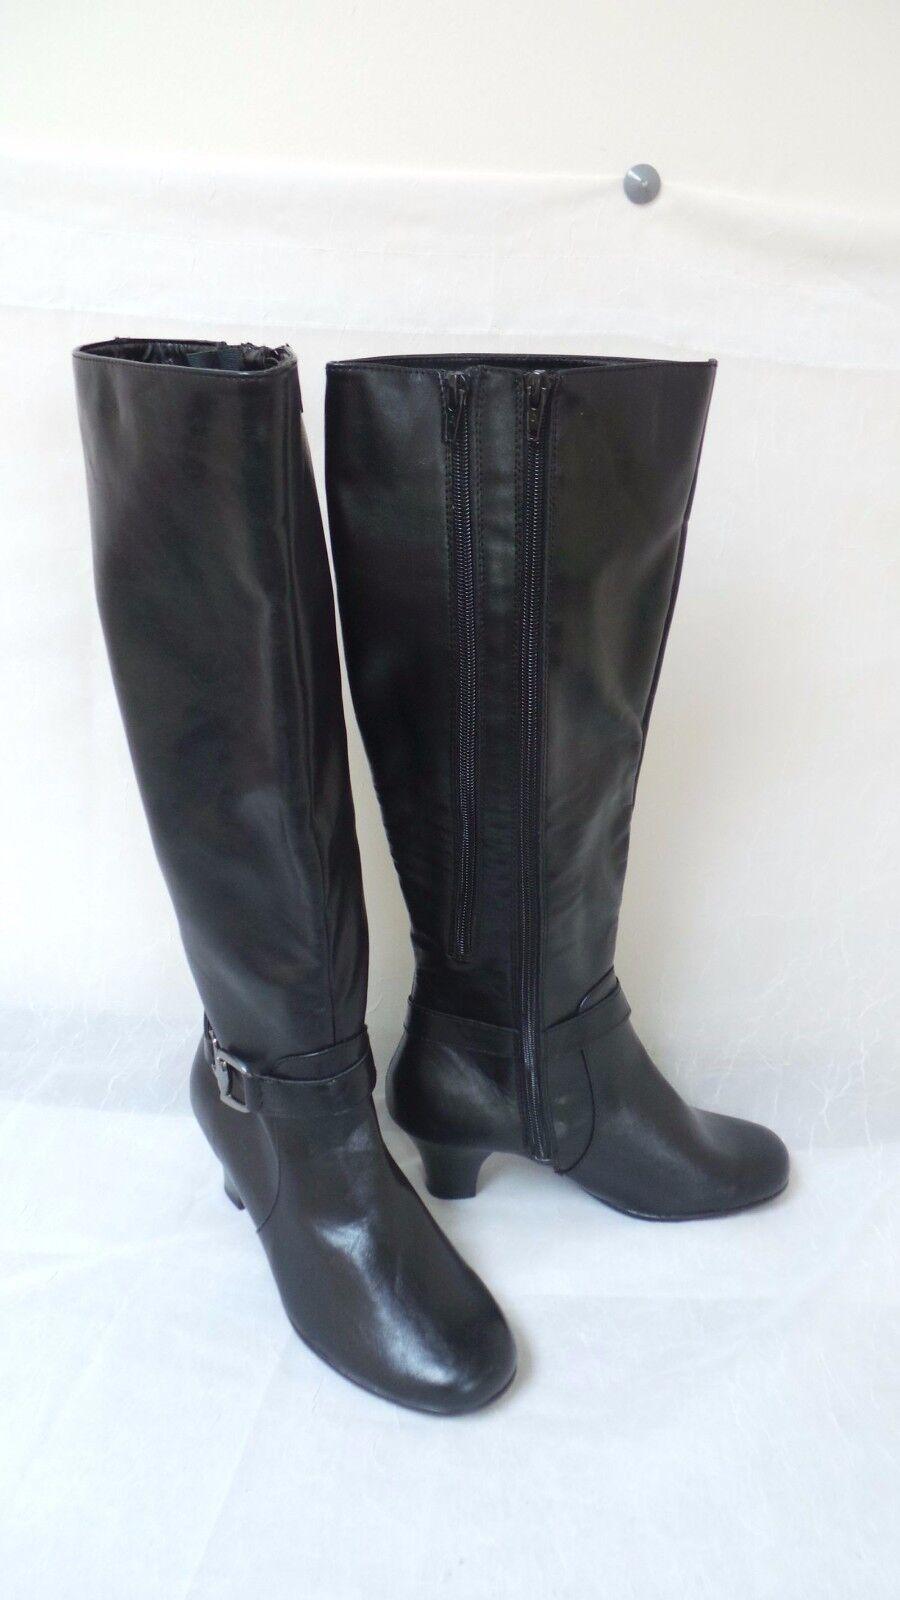 New  Aerosoles Womens Pariwinkle Knee High Boots-Black  150K